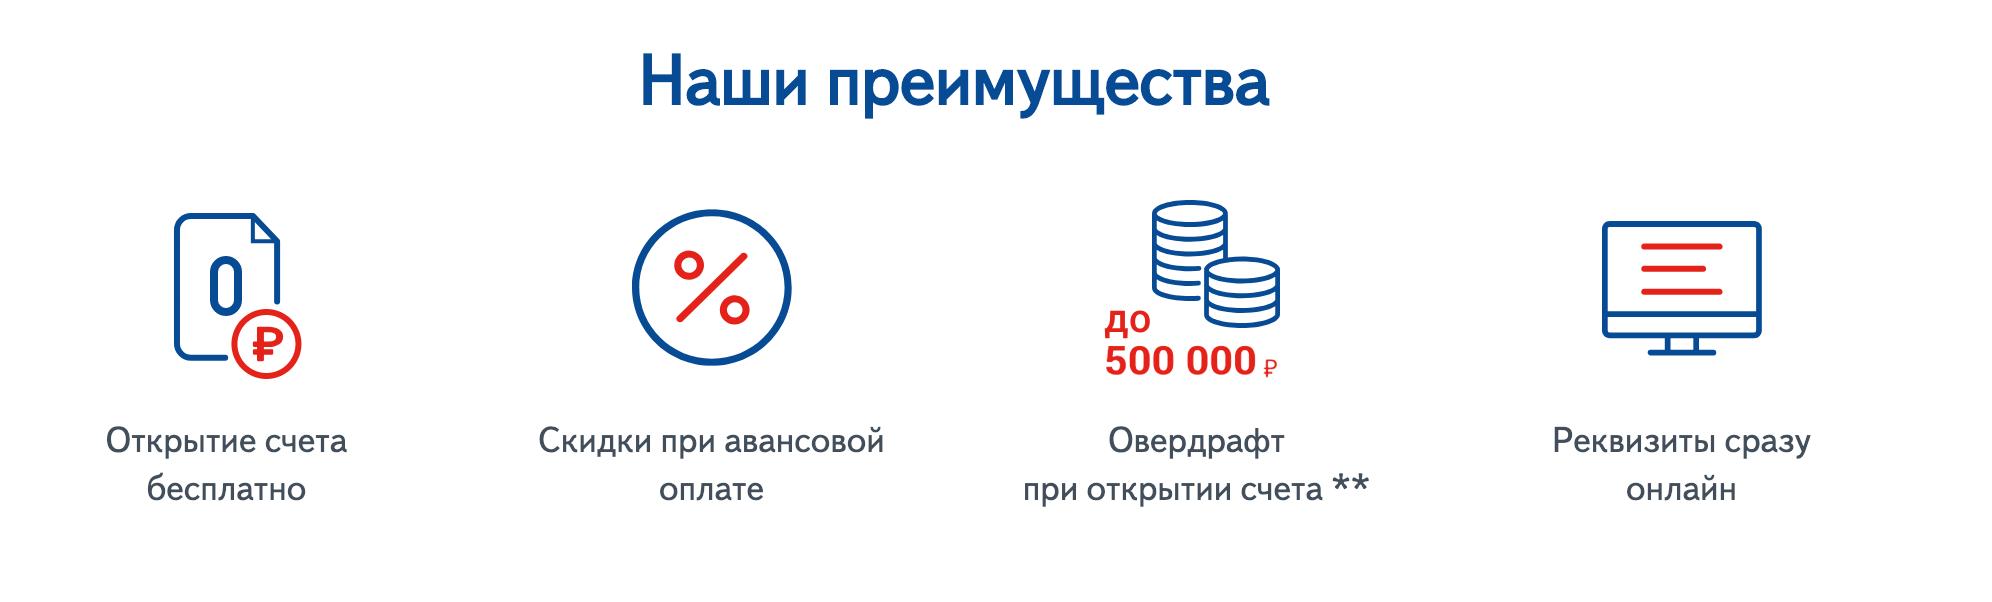 расчетный банк деньги онлайн